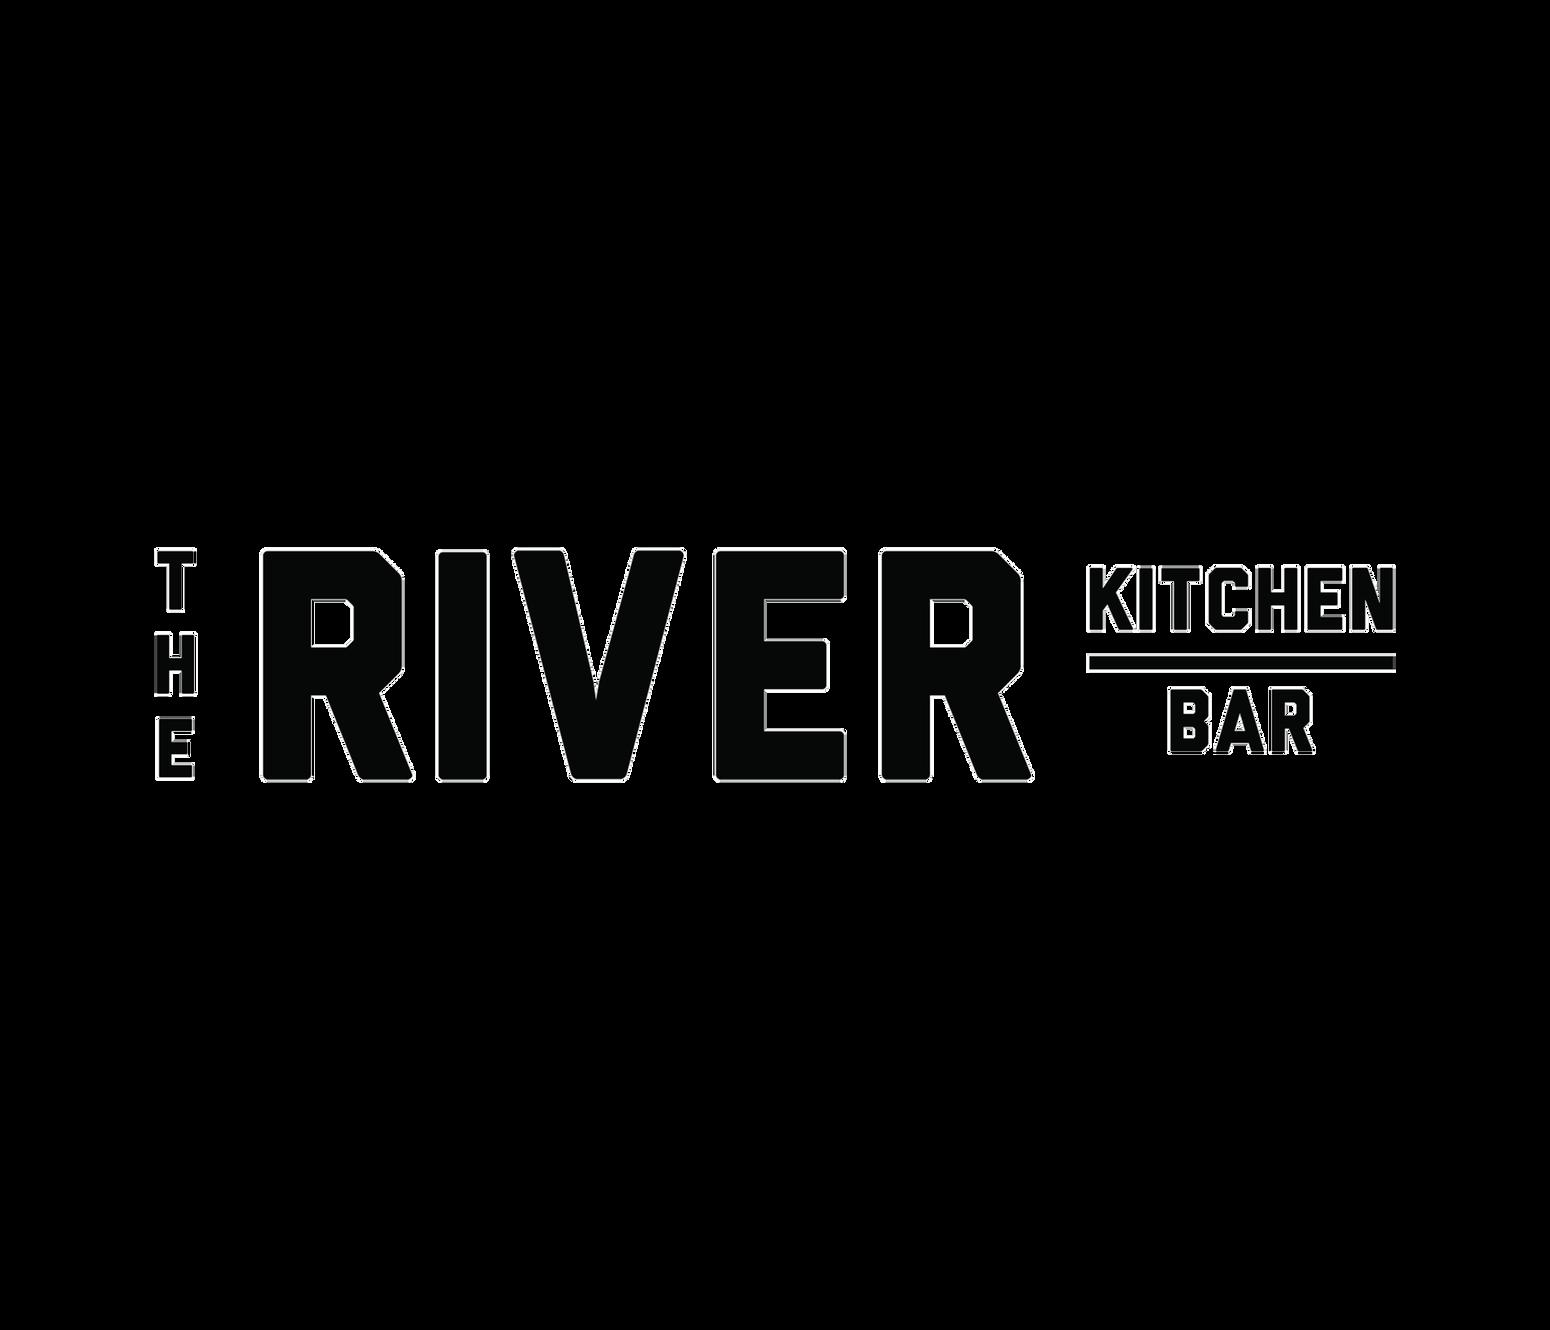 Brunch The River Kitchen And Bar Chicago Kitchen Logo Kitchen Bar Tech Company Logos